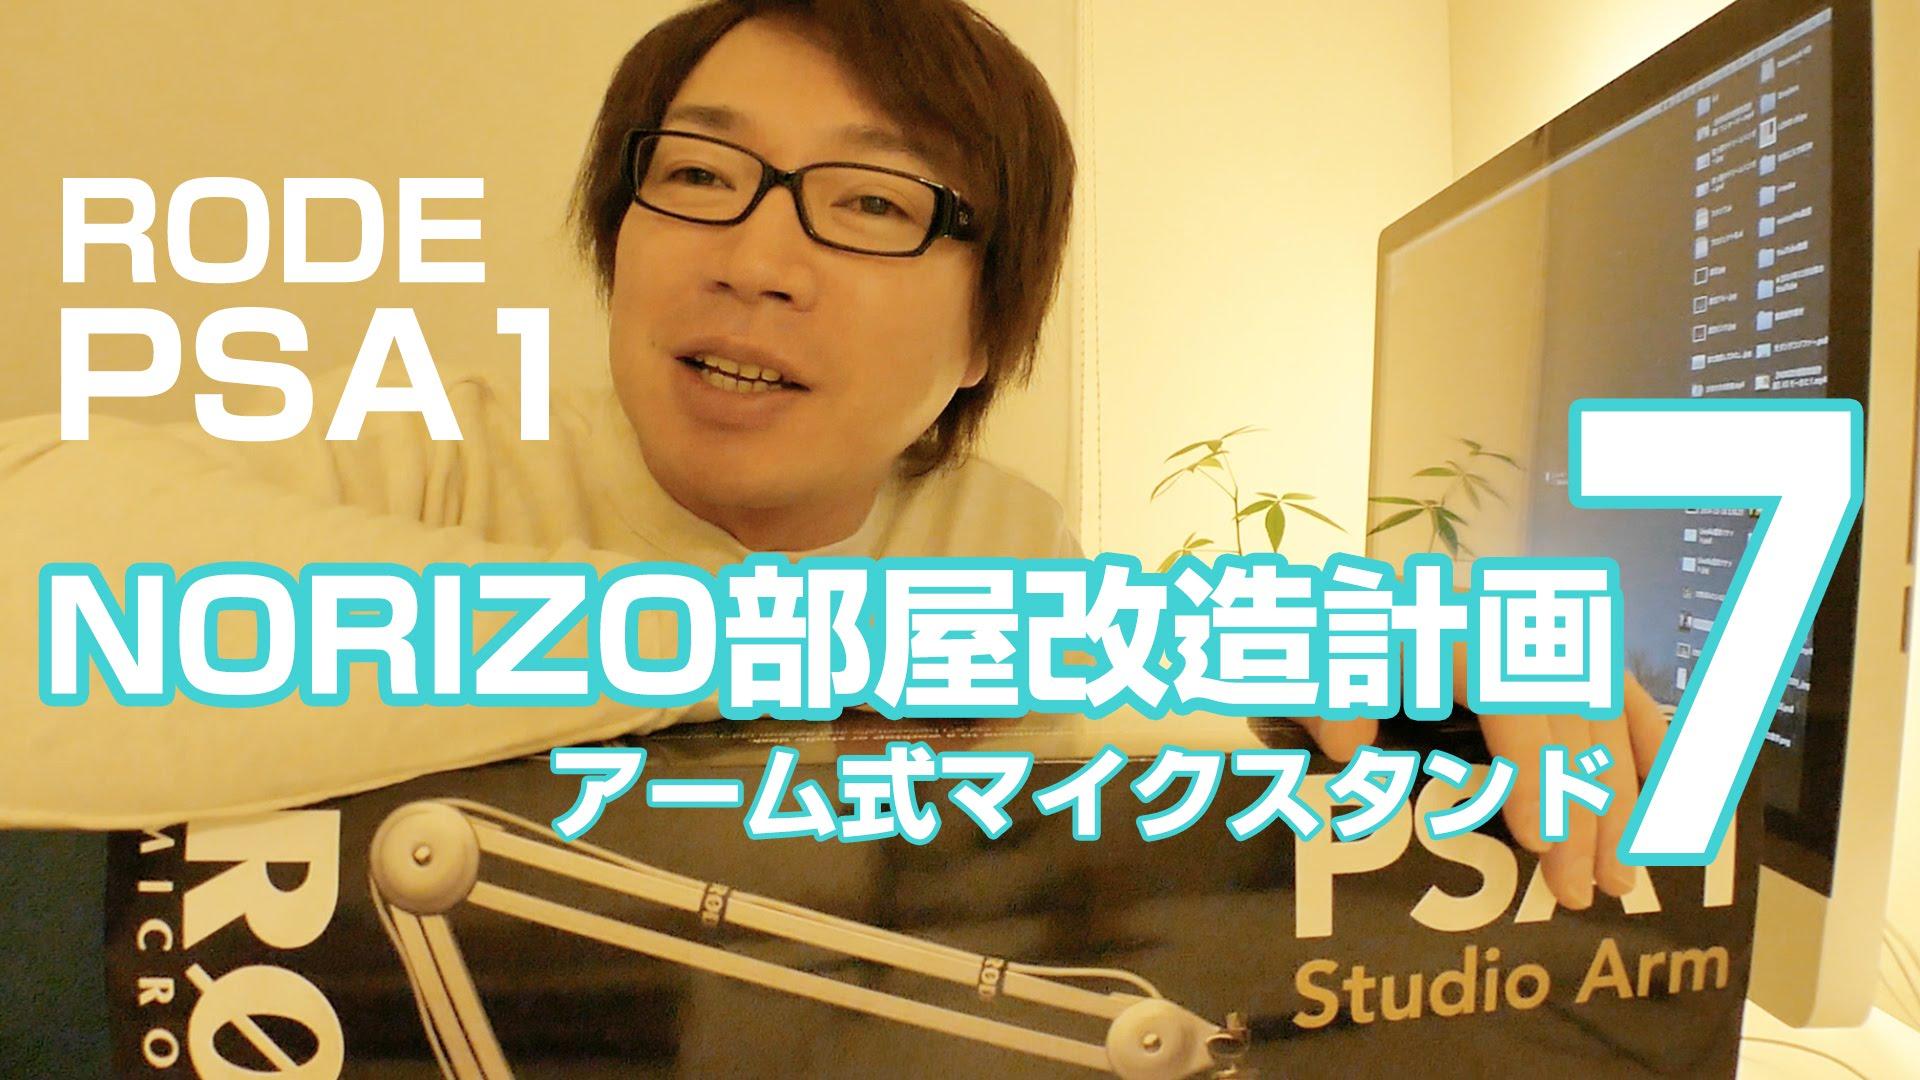 【NORIZO部屋改造計画】#7 RODE PSA1 Studio Armをインテリアに